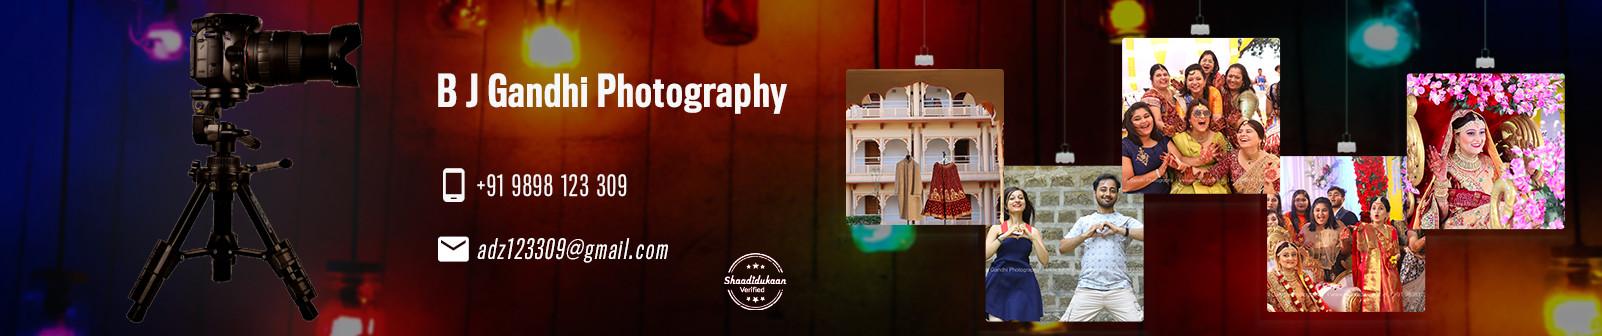 b-j-gandhi-photography